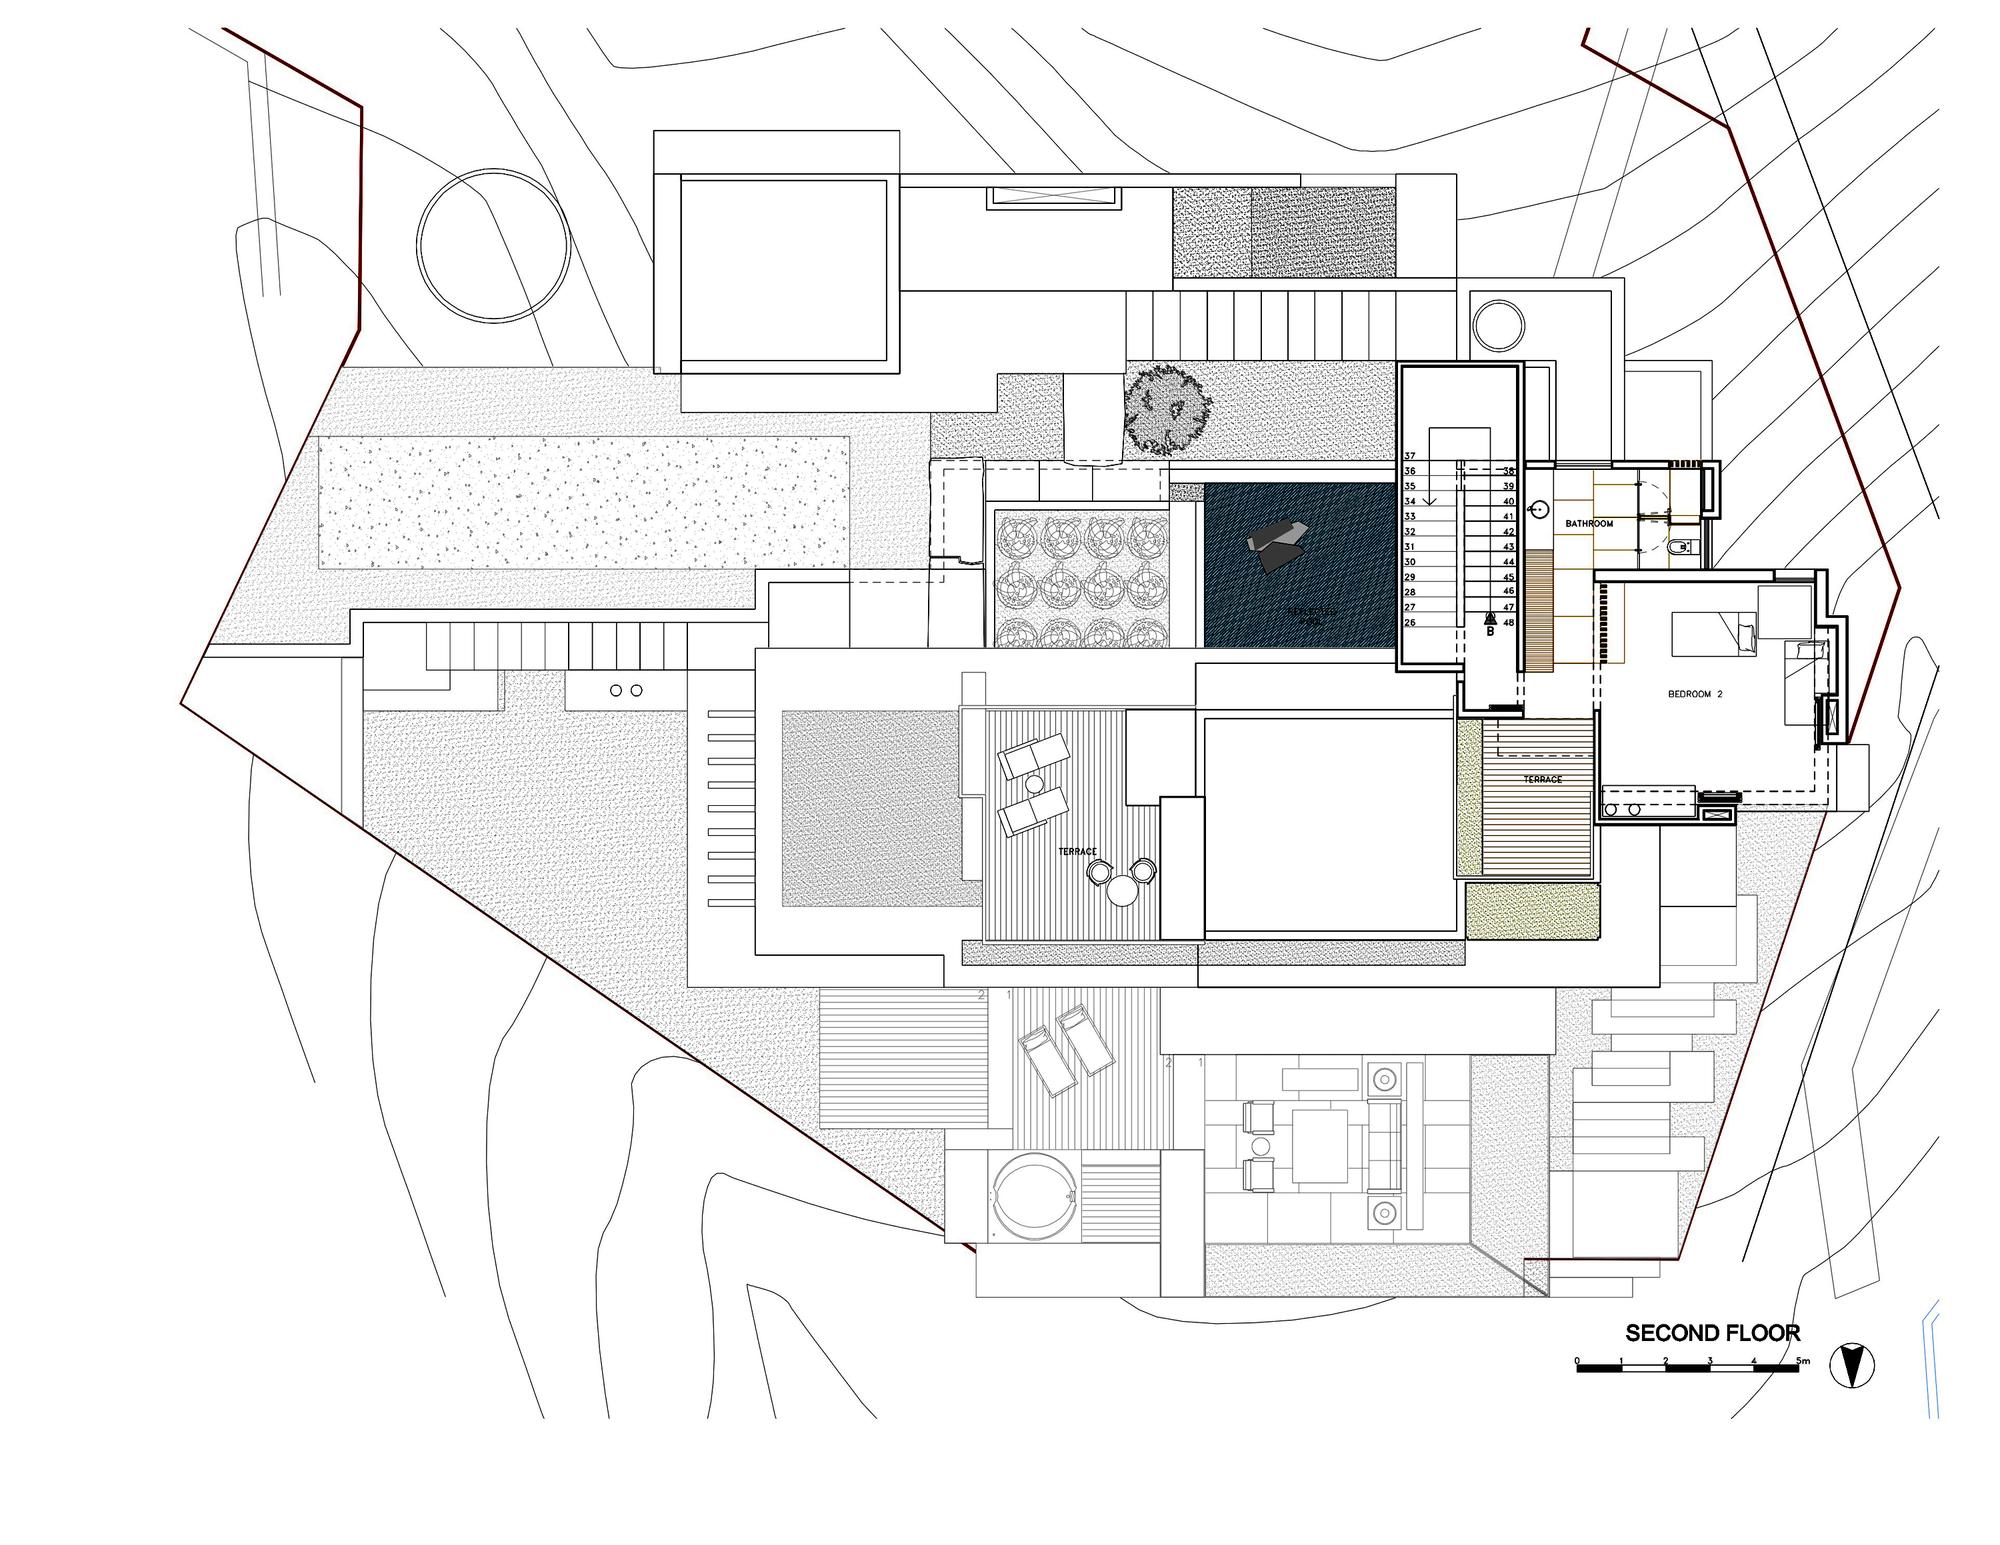 530ebaeec07a80ed3b00015c_house-maza-chk-arquitectura_second_floor